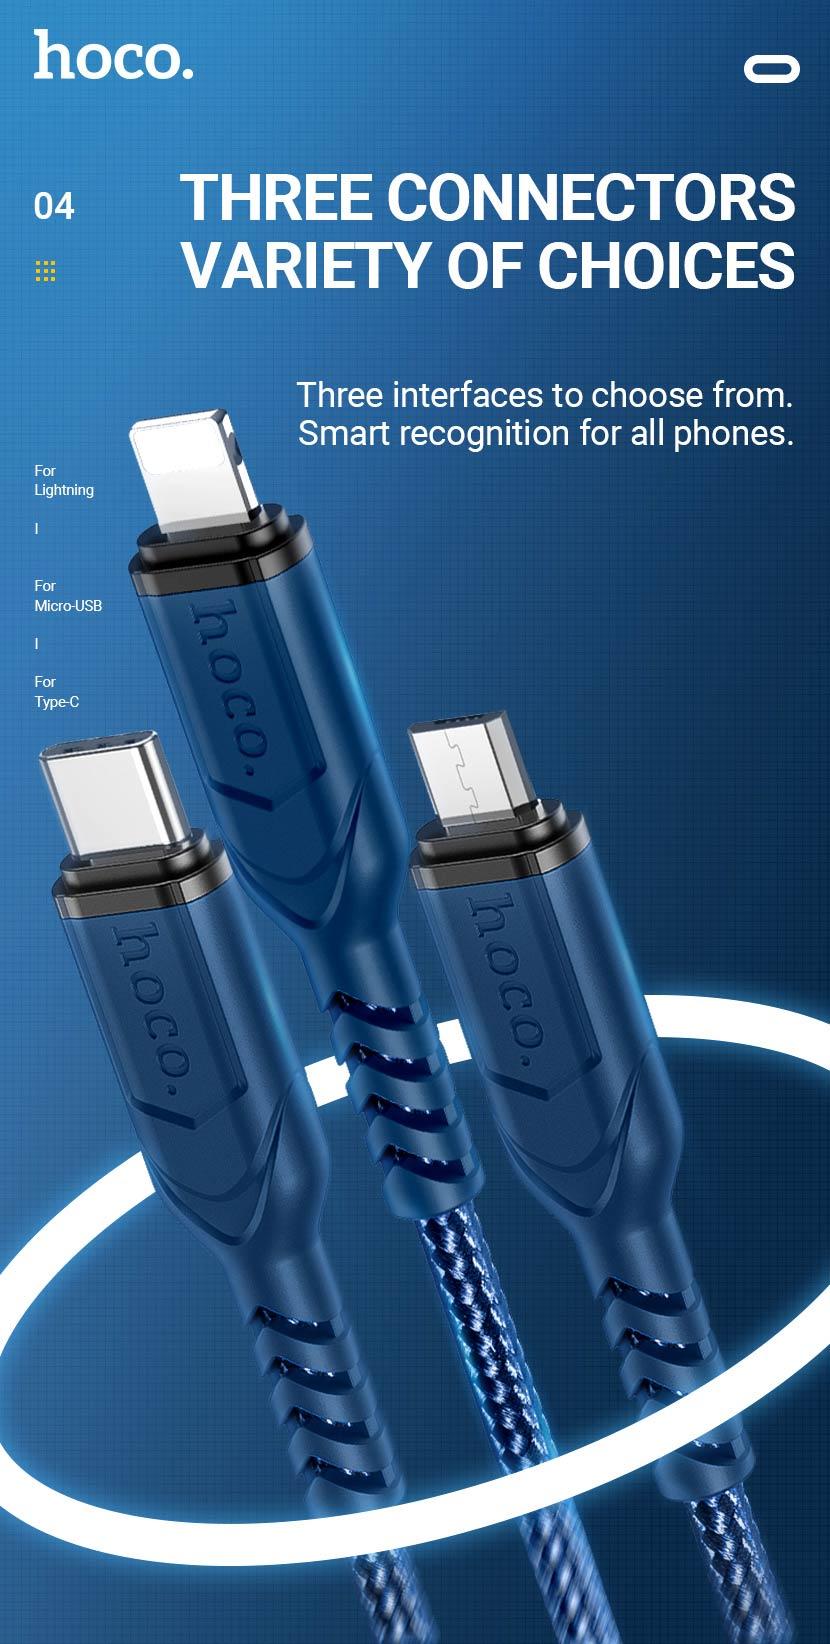 hoco news x59 victory charging data cable connectors en